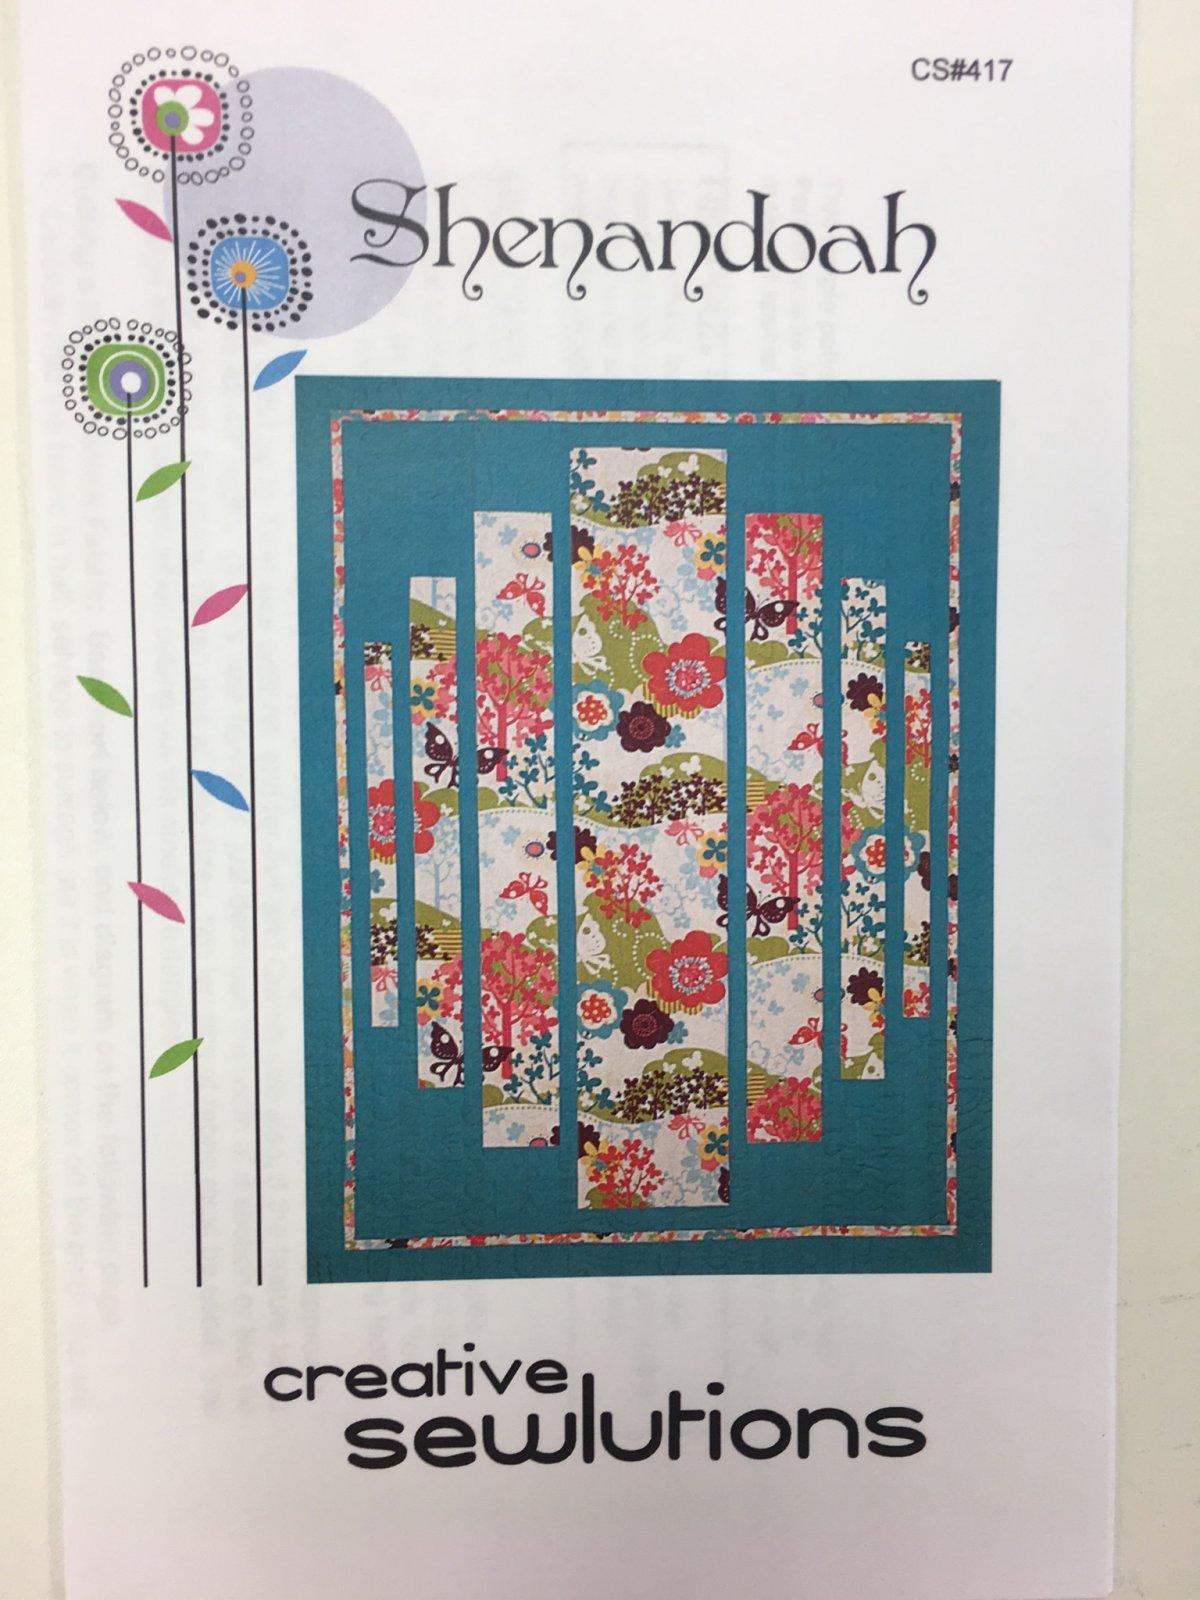 Shenandoah Pattern